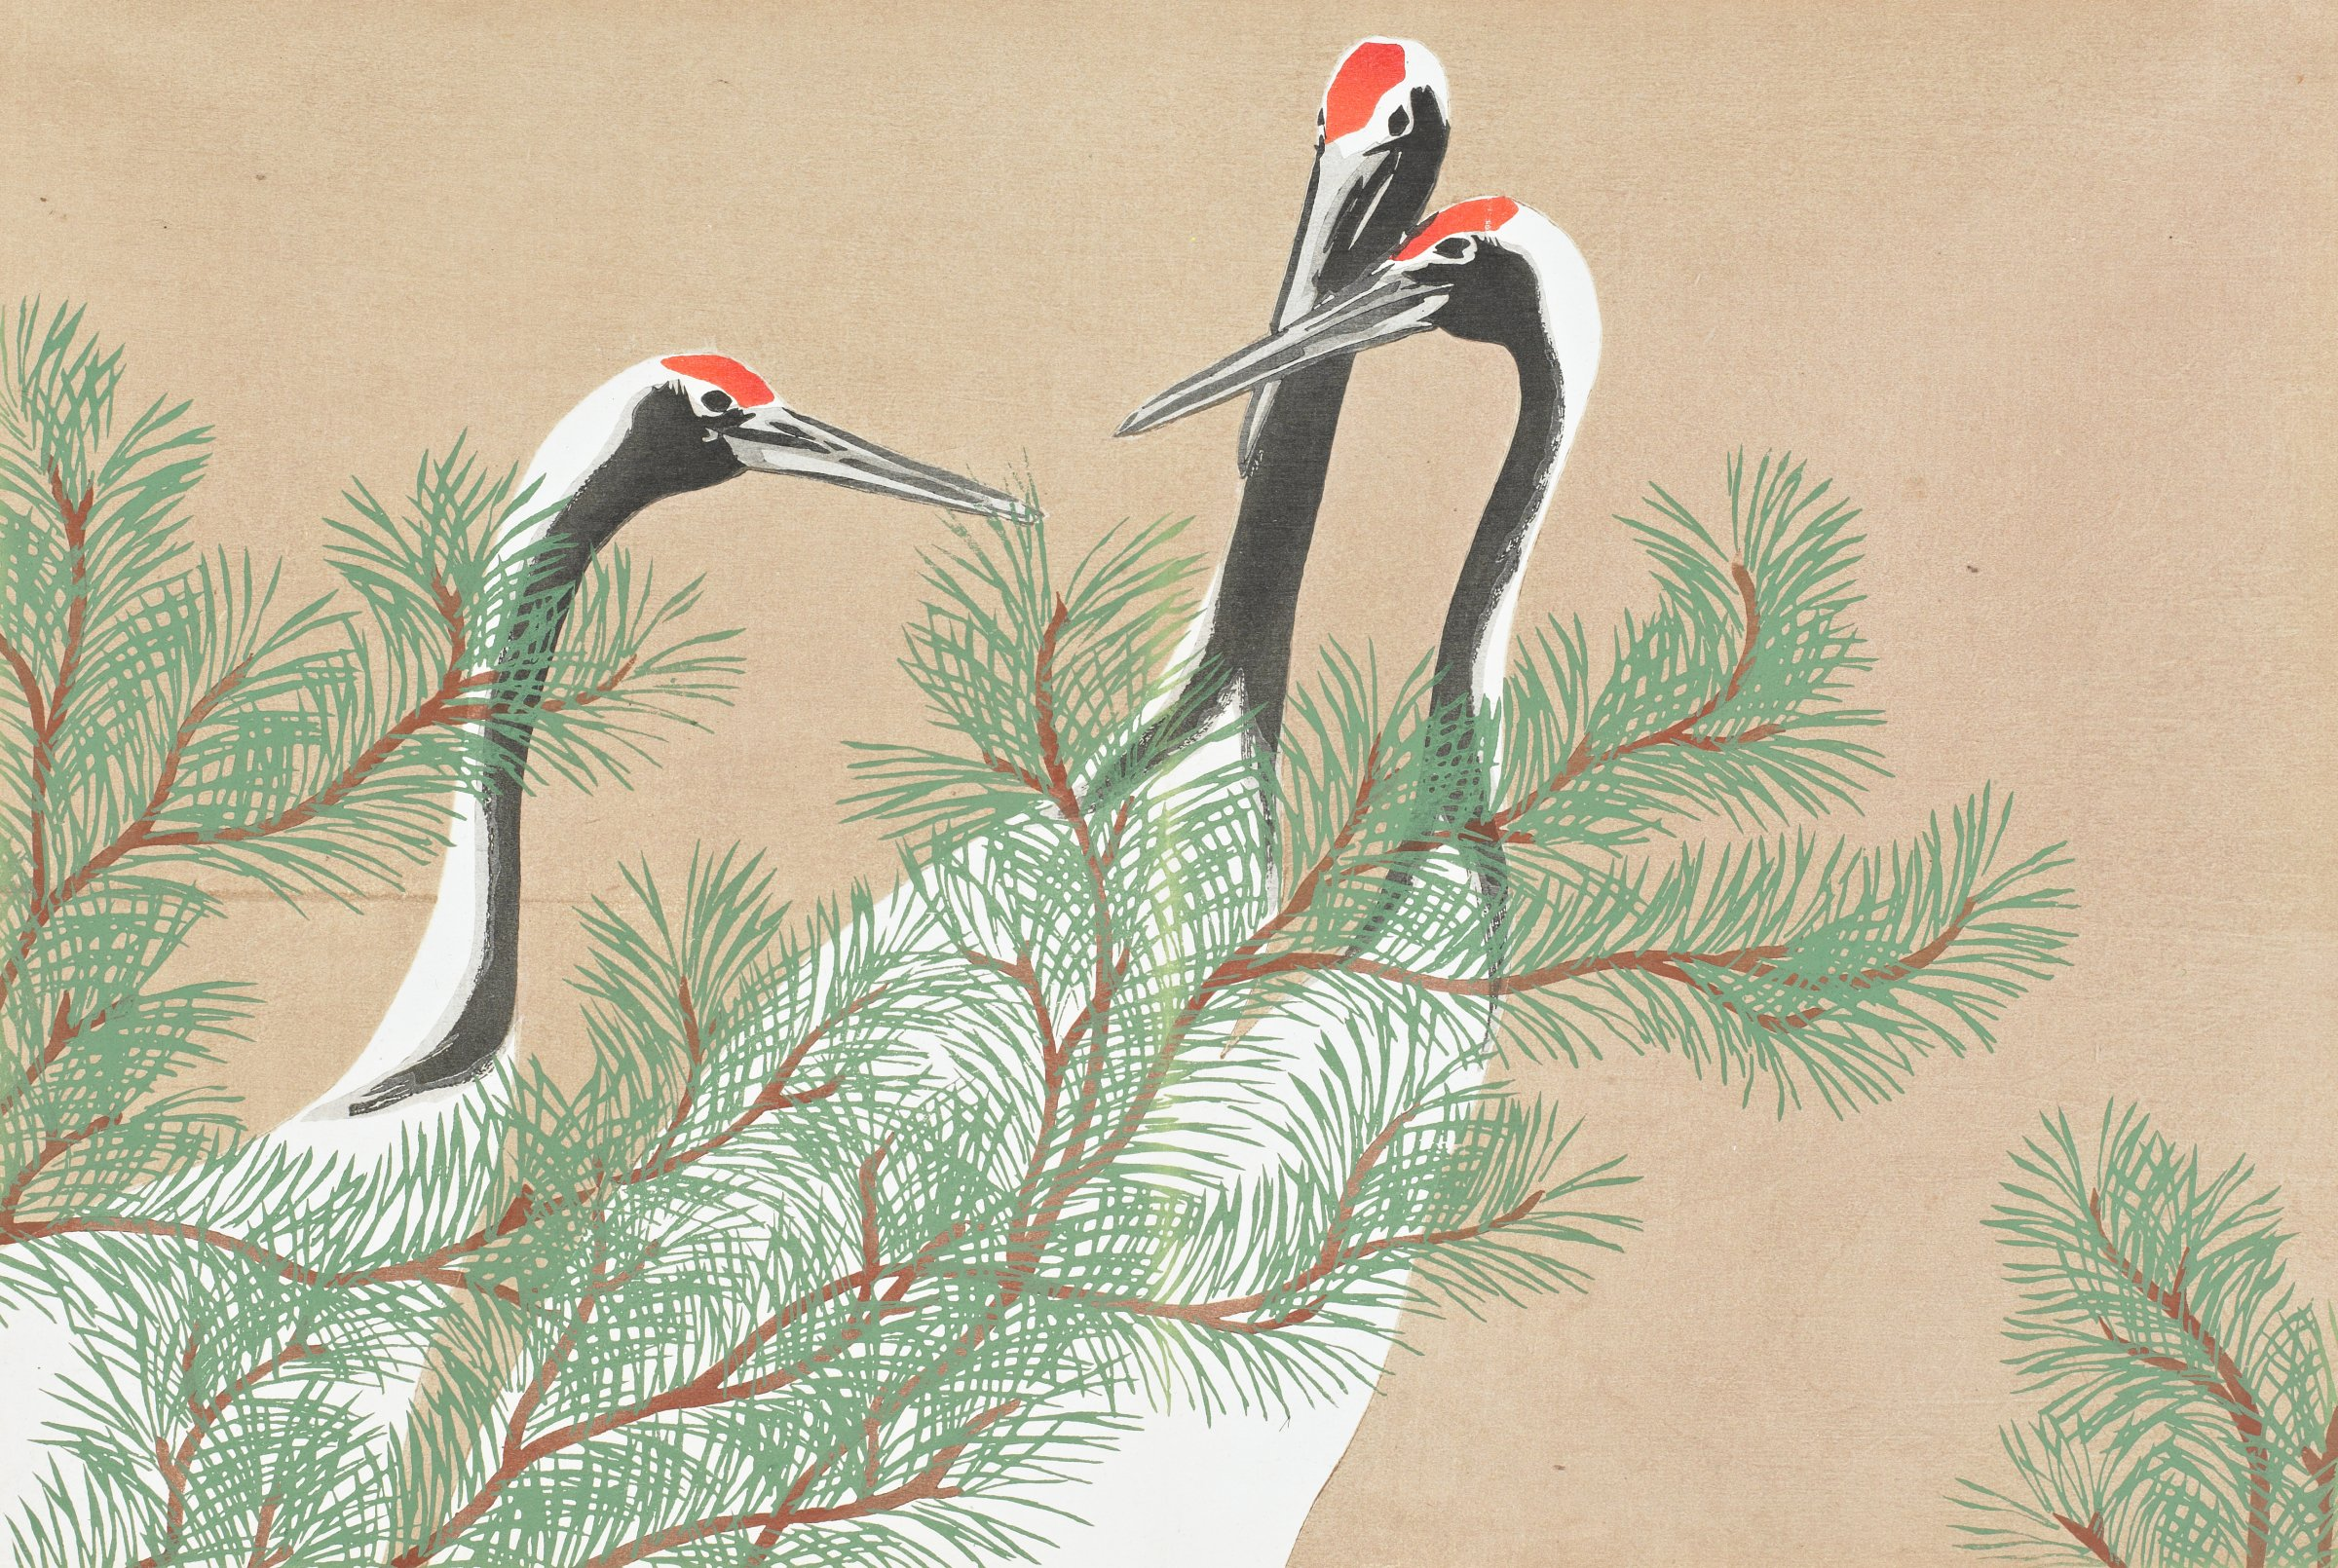 Tsuru (Cranes), from Momoyogusa (A World of Things), Volume 2, Kamisaka Sekka, ink and color on paper